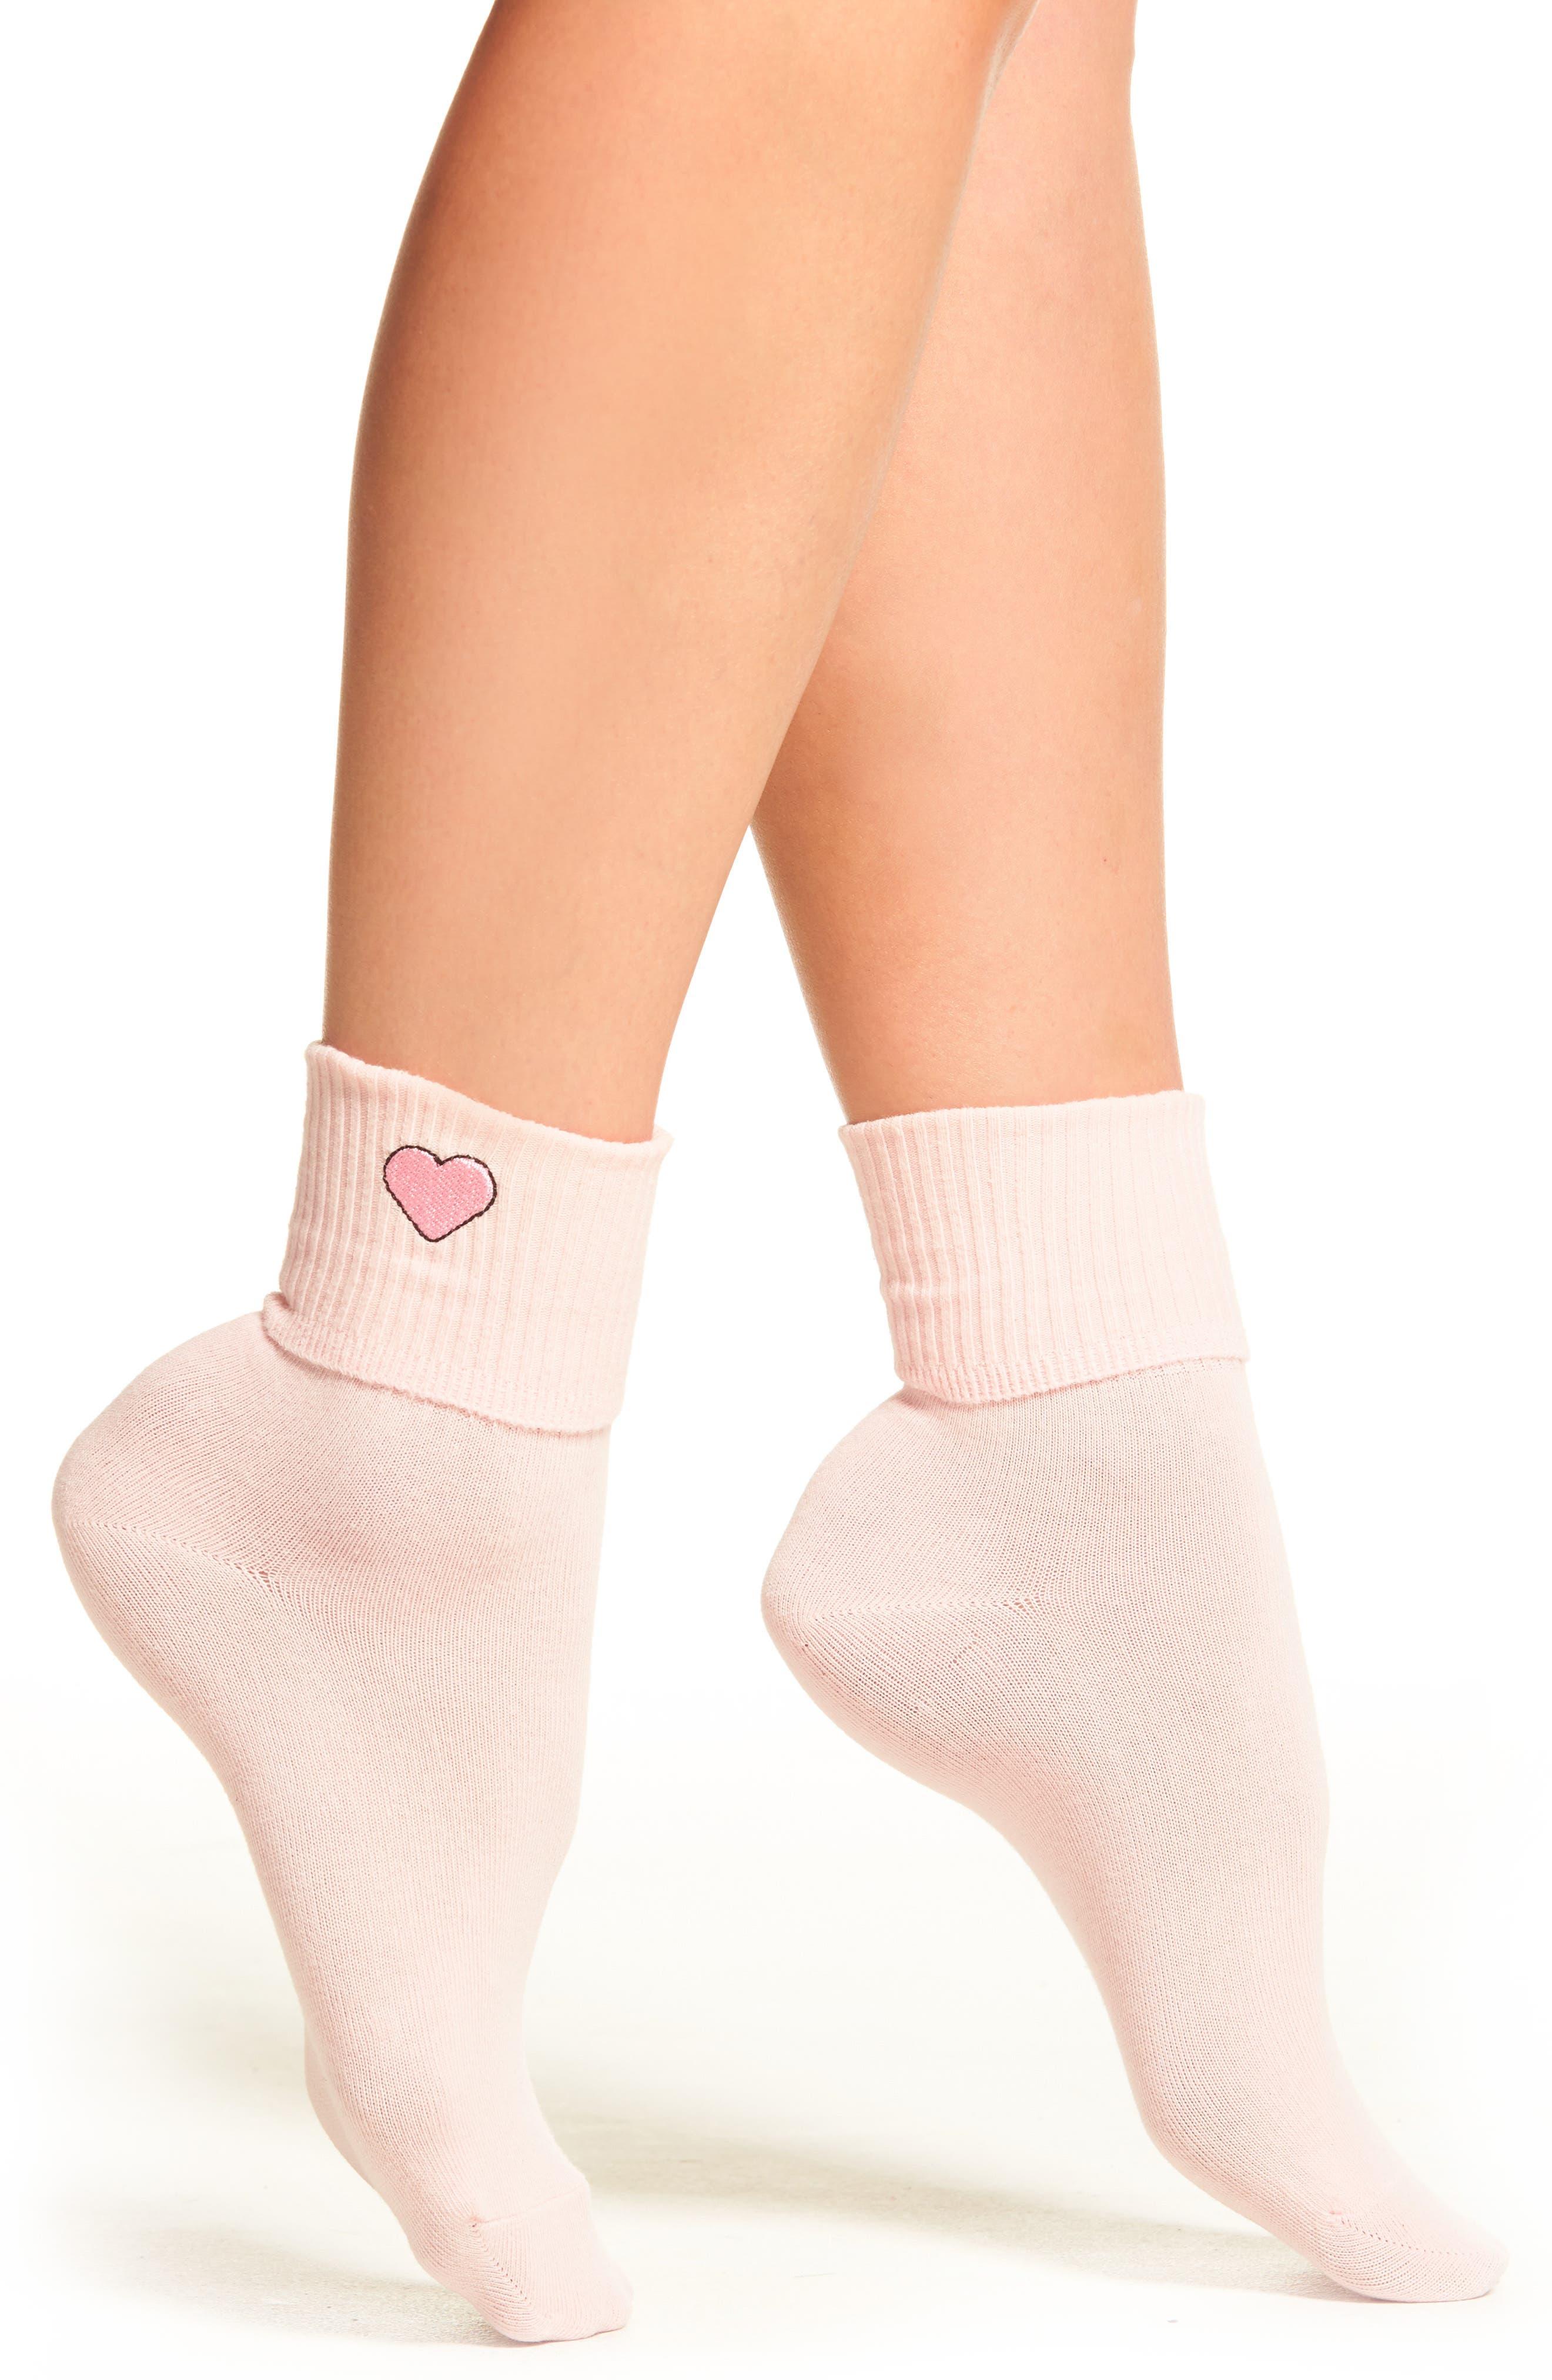 Heart Socks,                         Main,                         color, Pink